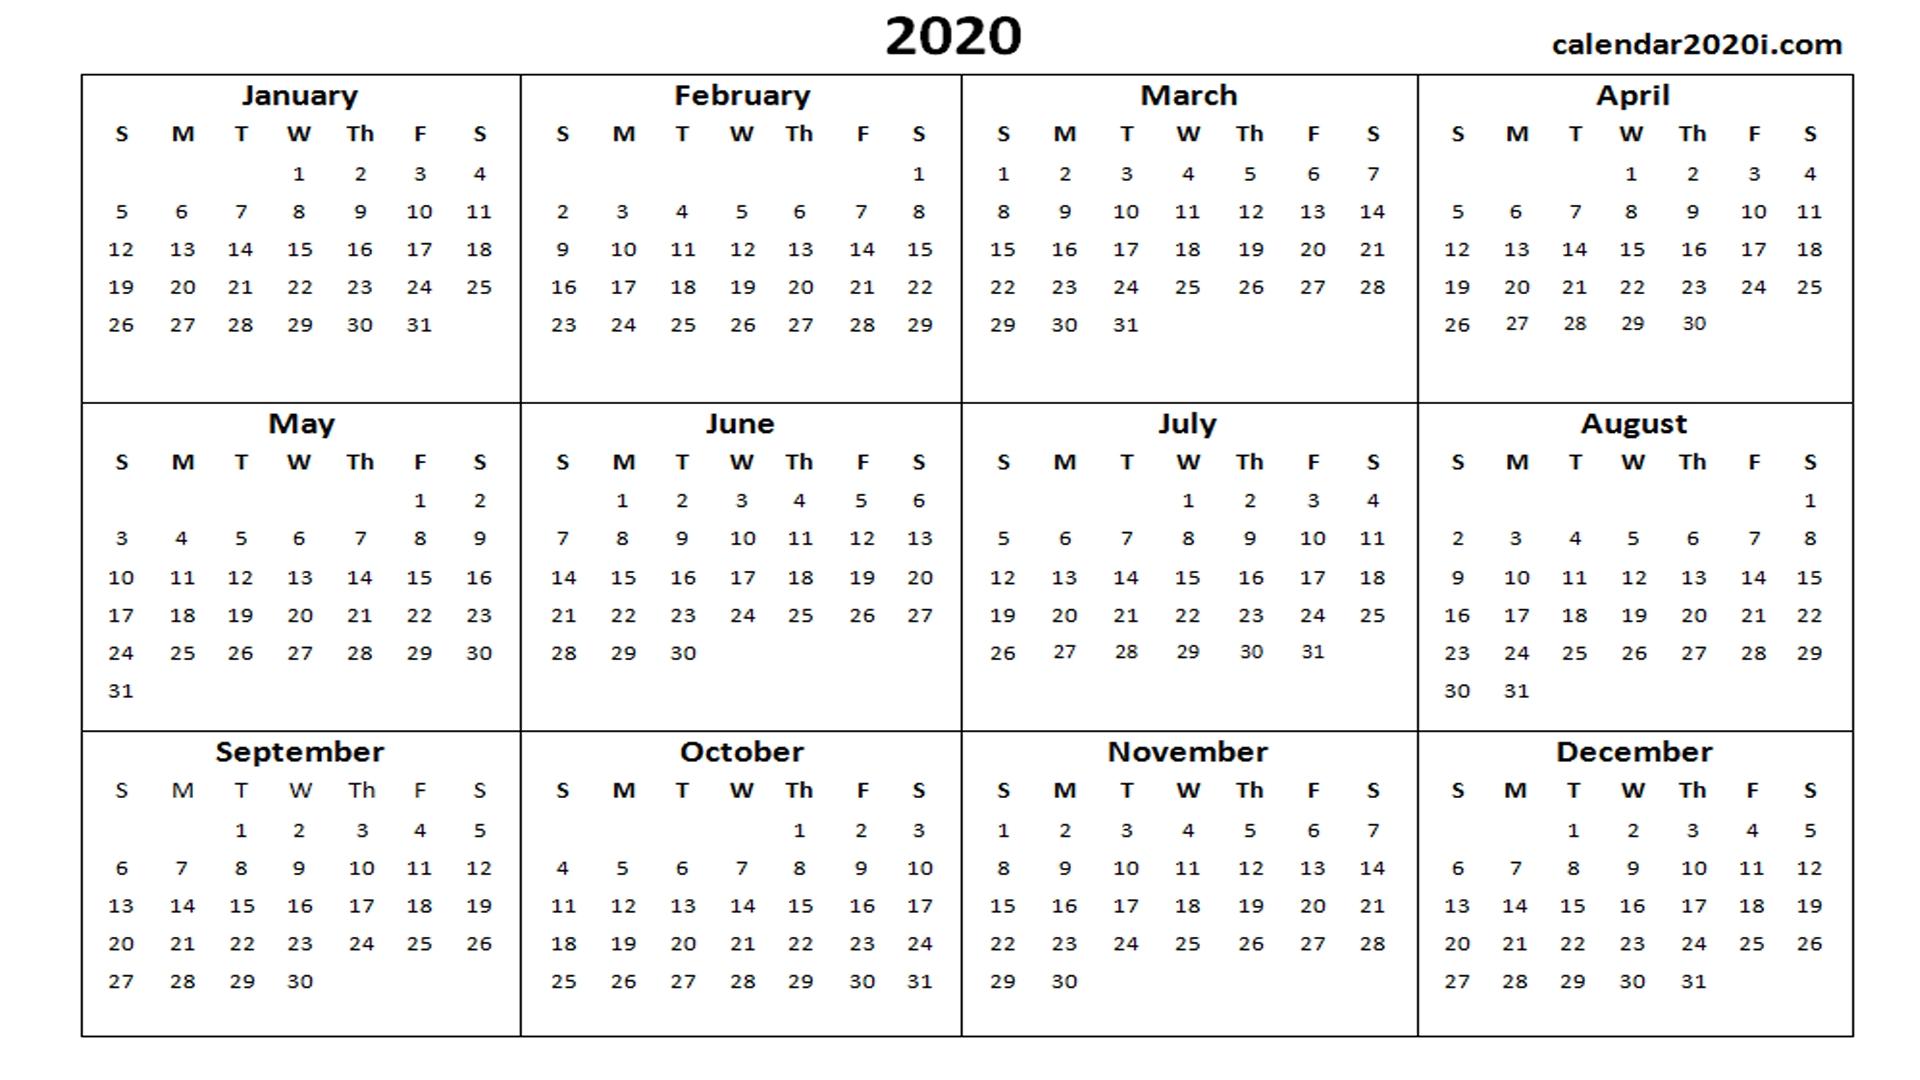 2020 Calendar Printable Template Holidays, Word, Excel, Pdf Exceptional Microsoft Word Printable Calendar 2020